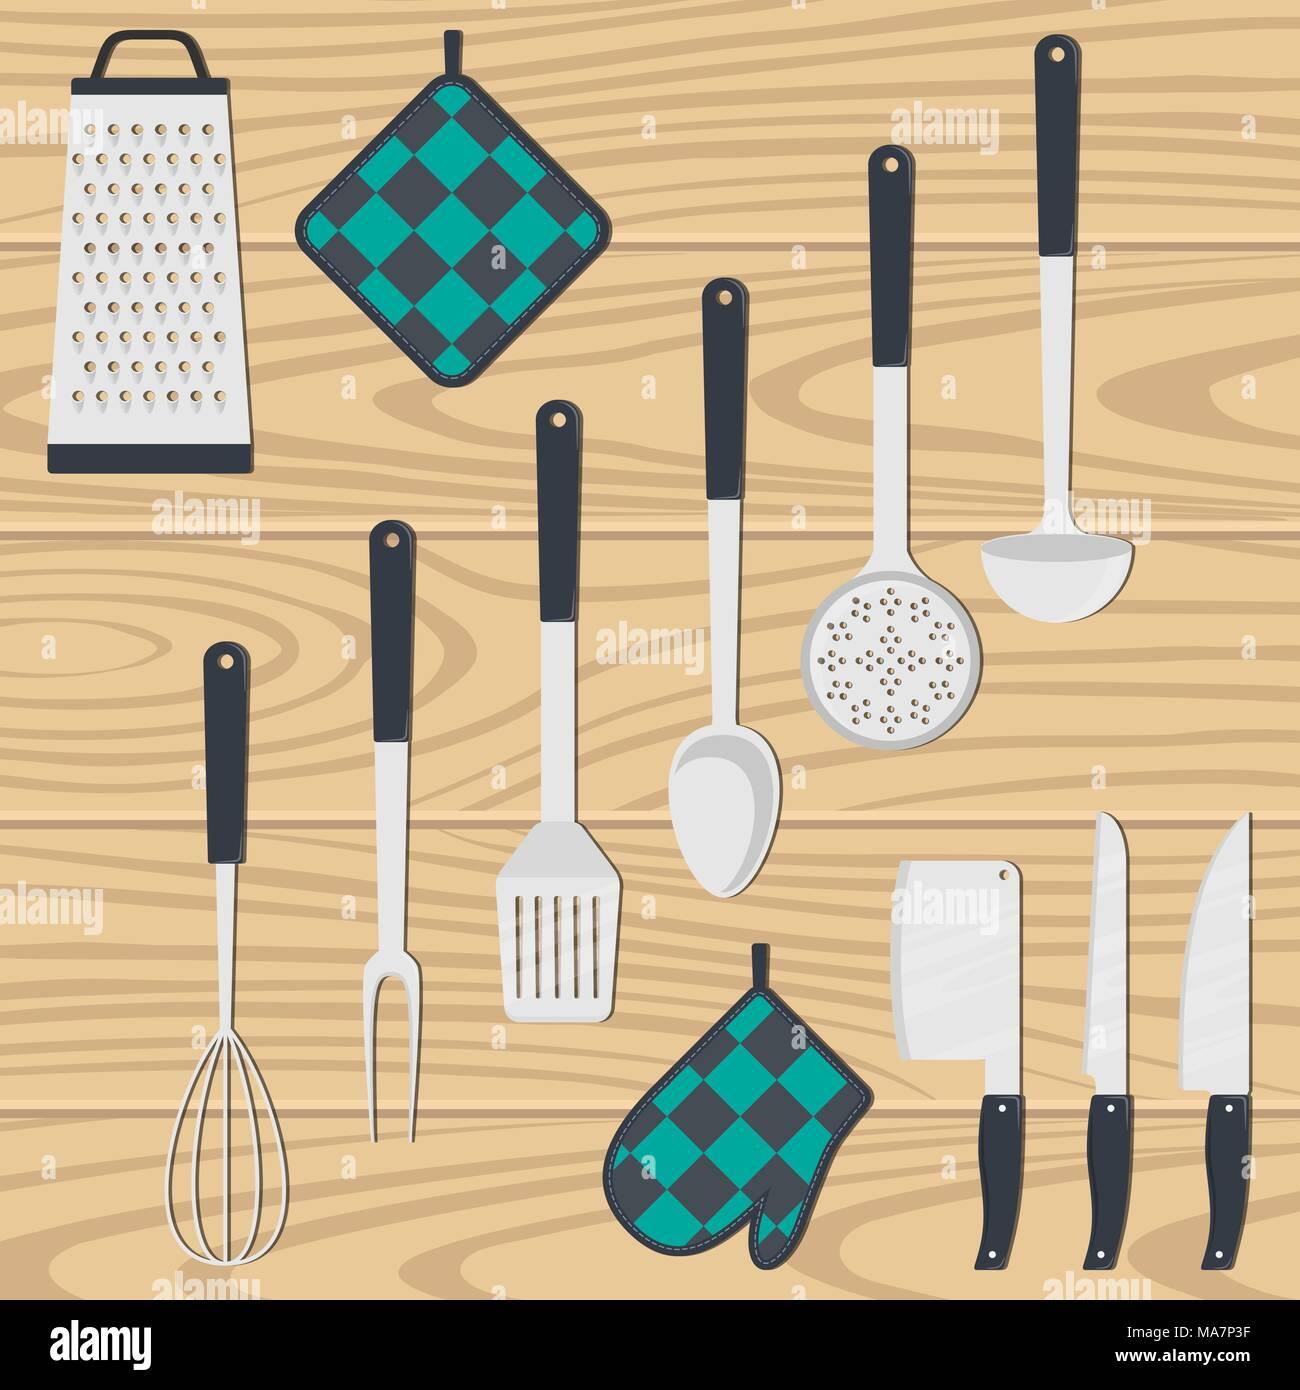 Kitchen utensils, set. Ladle, spatula, whisk, skimmer, spoon grater kitchen axe knife vector illustration isolated - Stock Vector